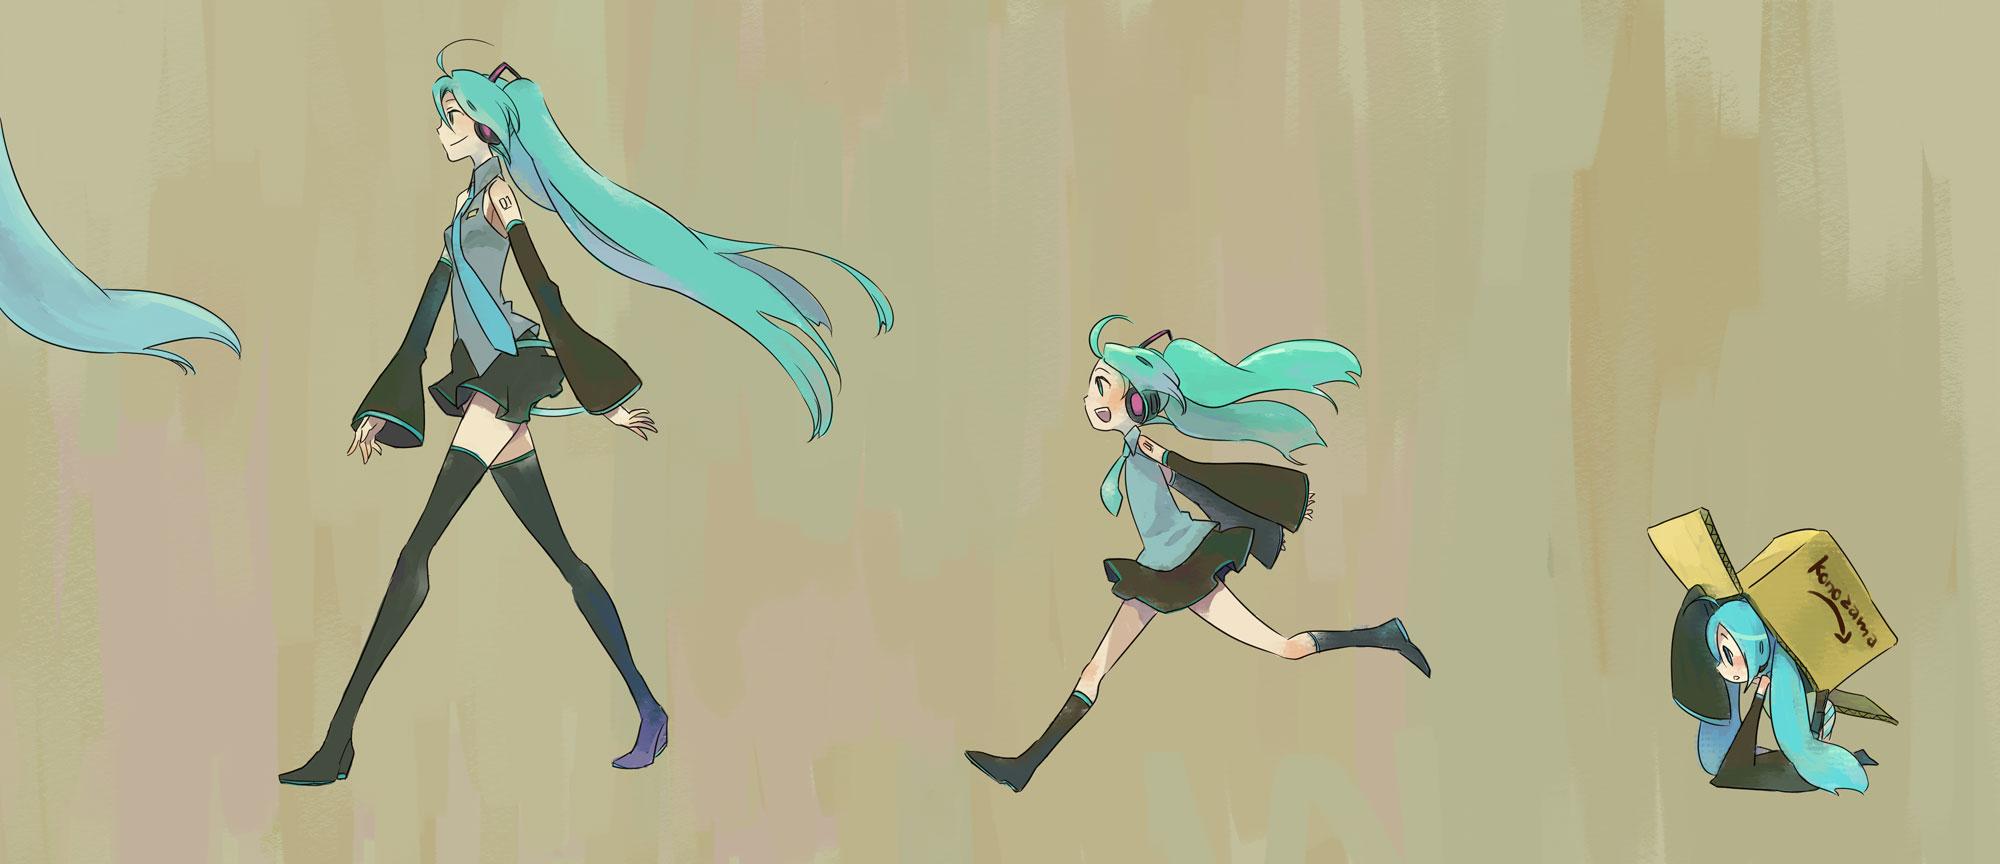 running anime wallpaper - photo #35